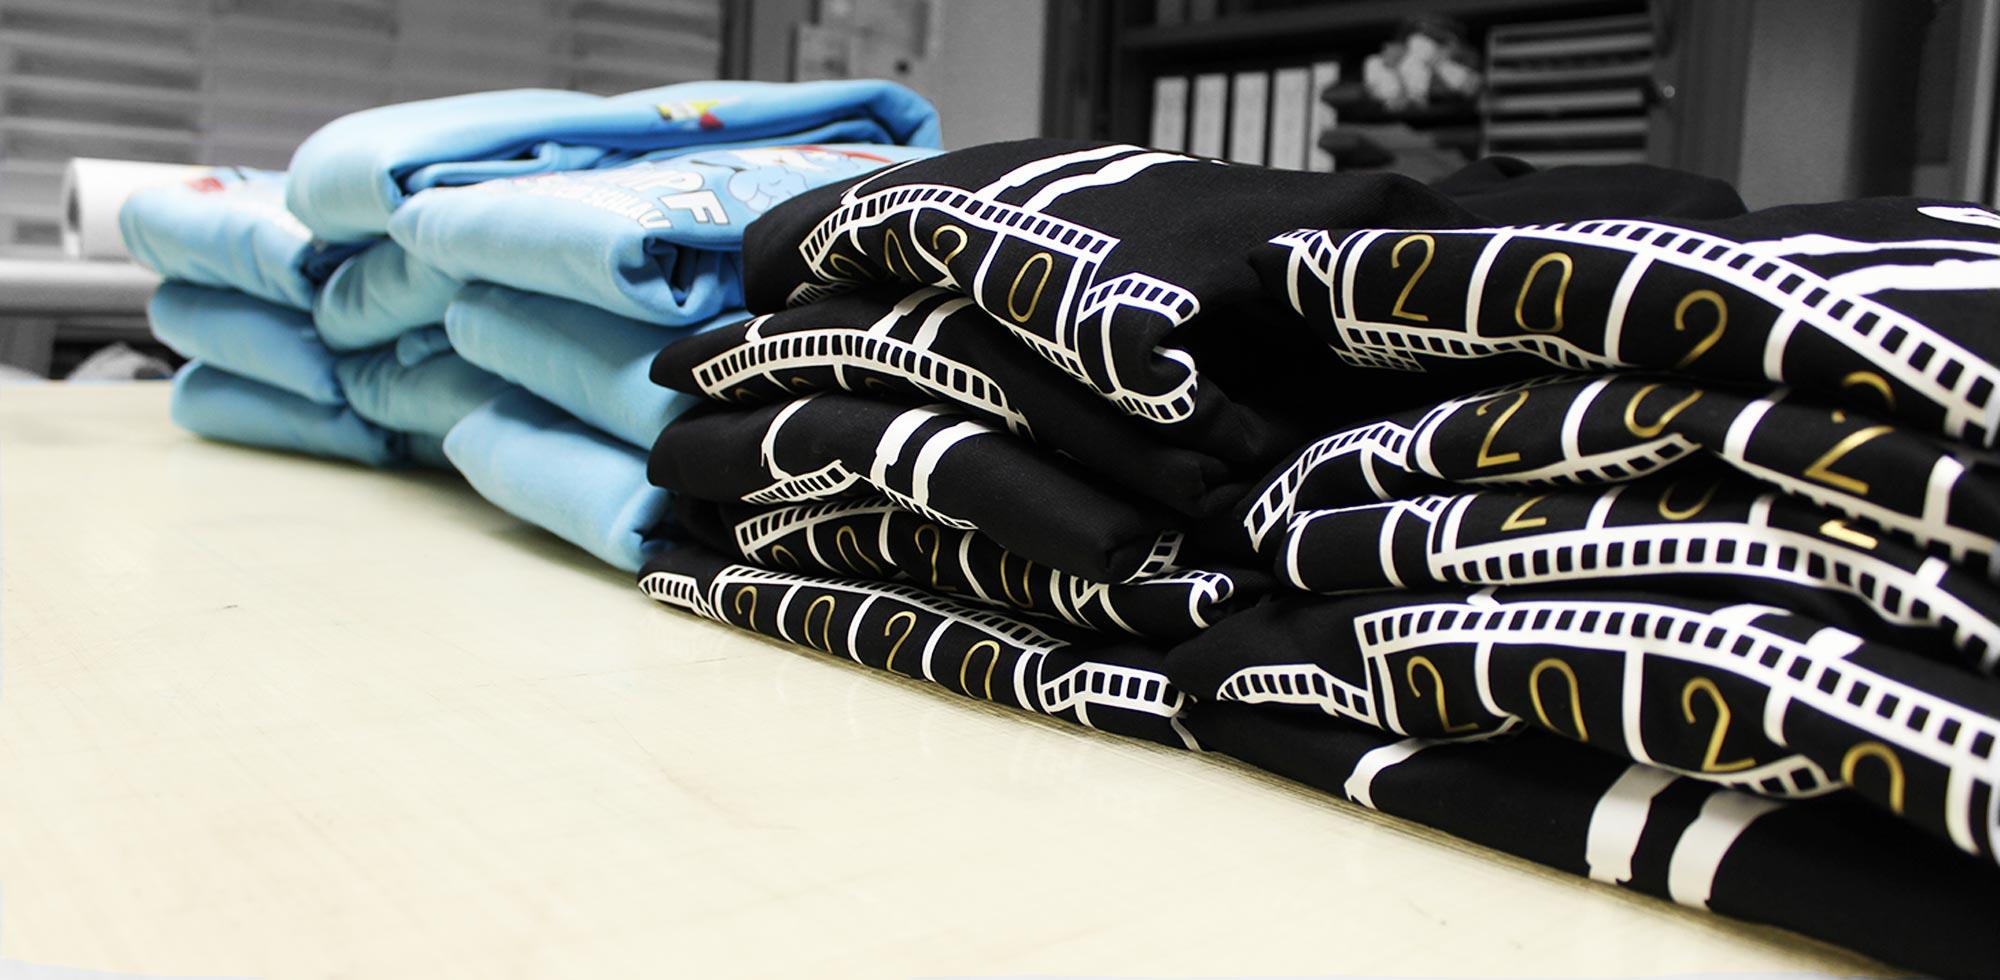 Textilveredelung GIRAFFIKKA 73642 Welzheim Rudersberger Str. 14